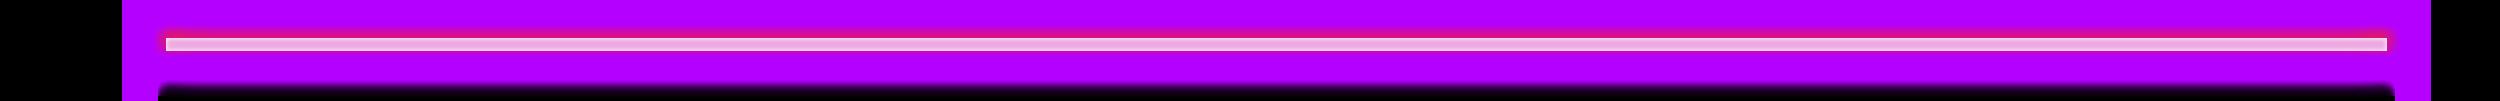 jessie.neon-line.png